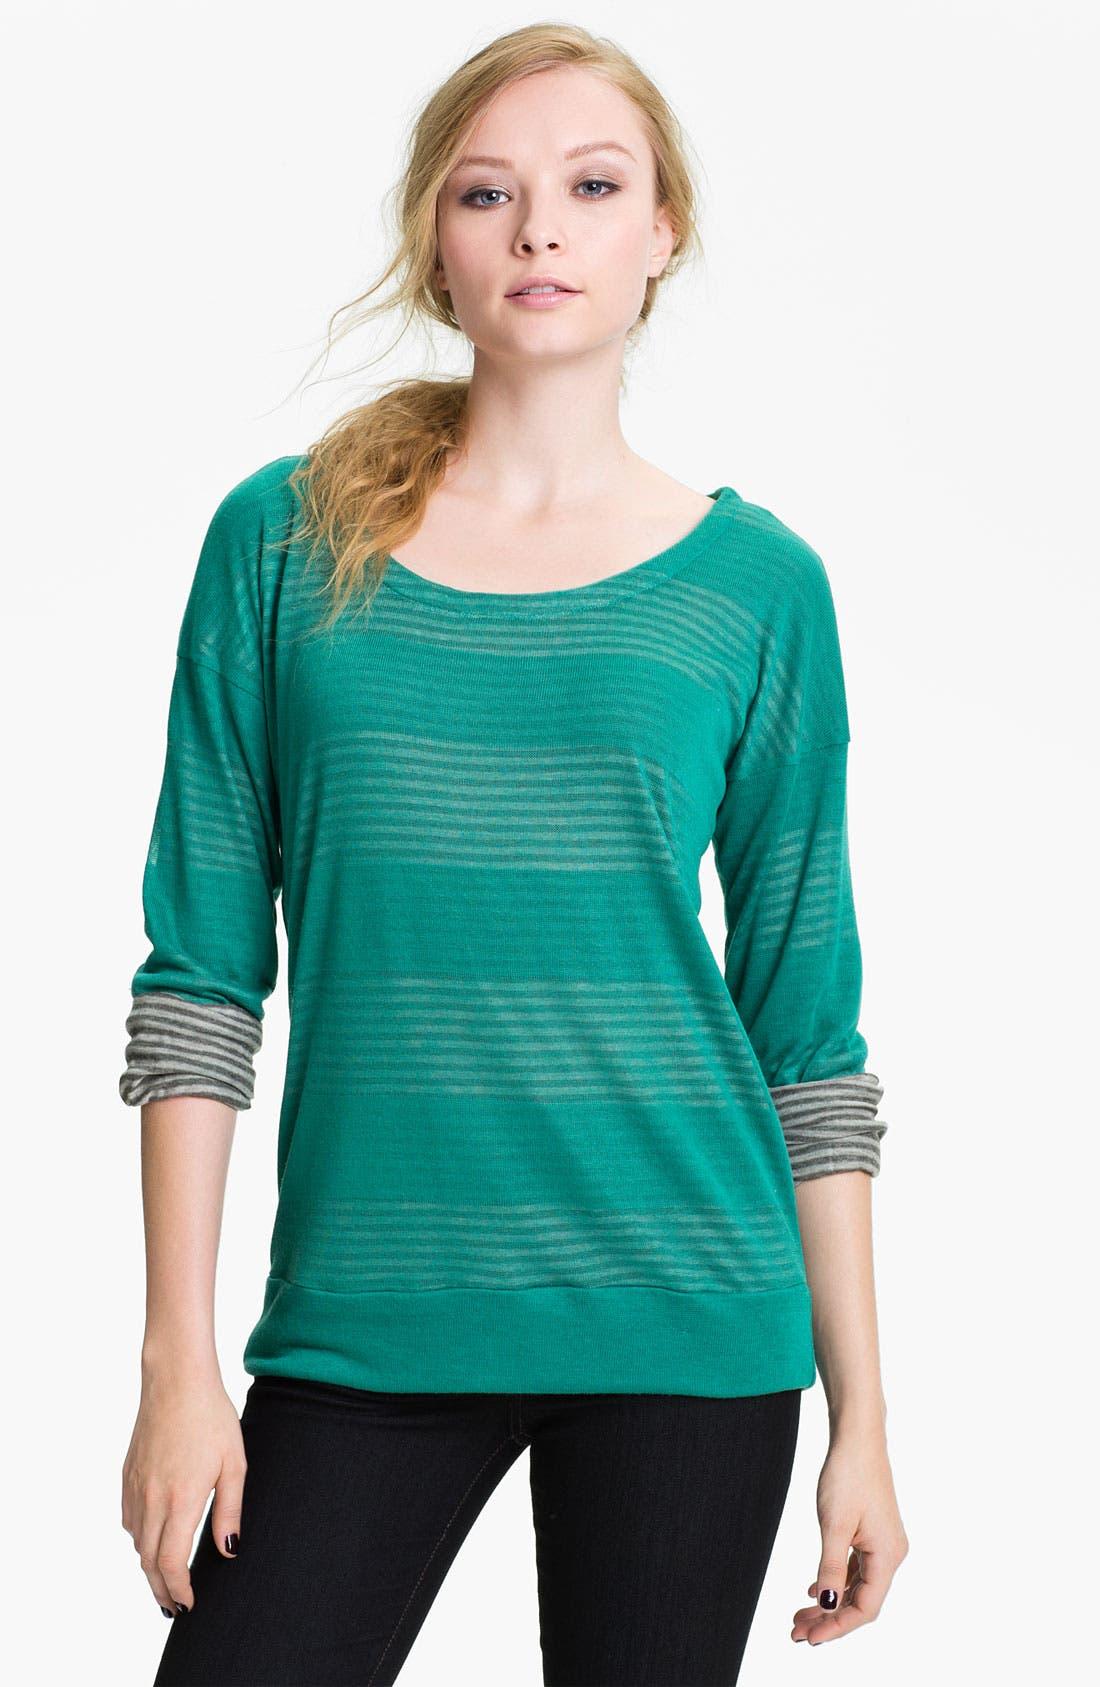 Alternate Image 1 Selected - Splendid Double Knit Stripe Top